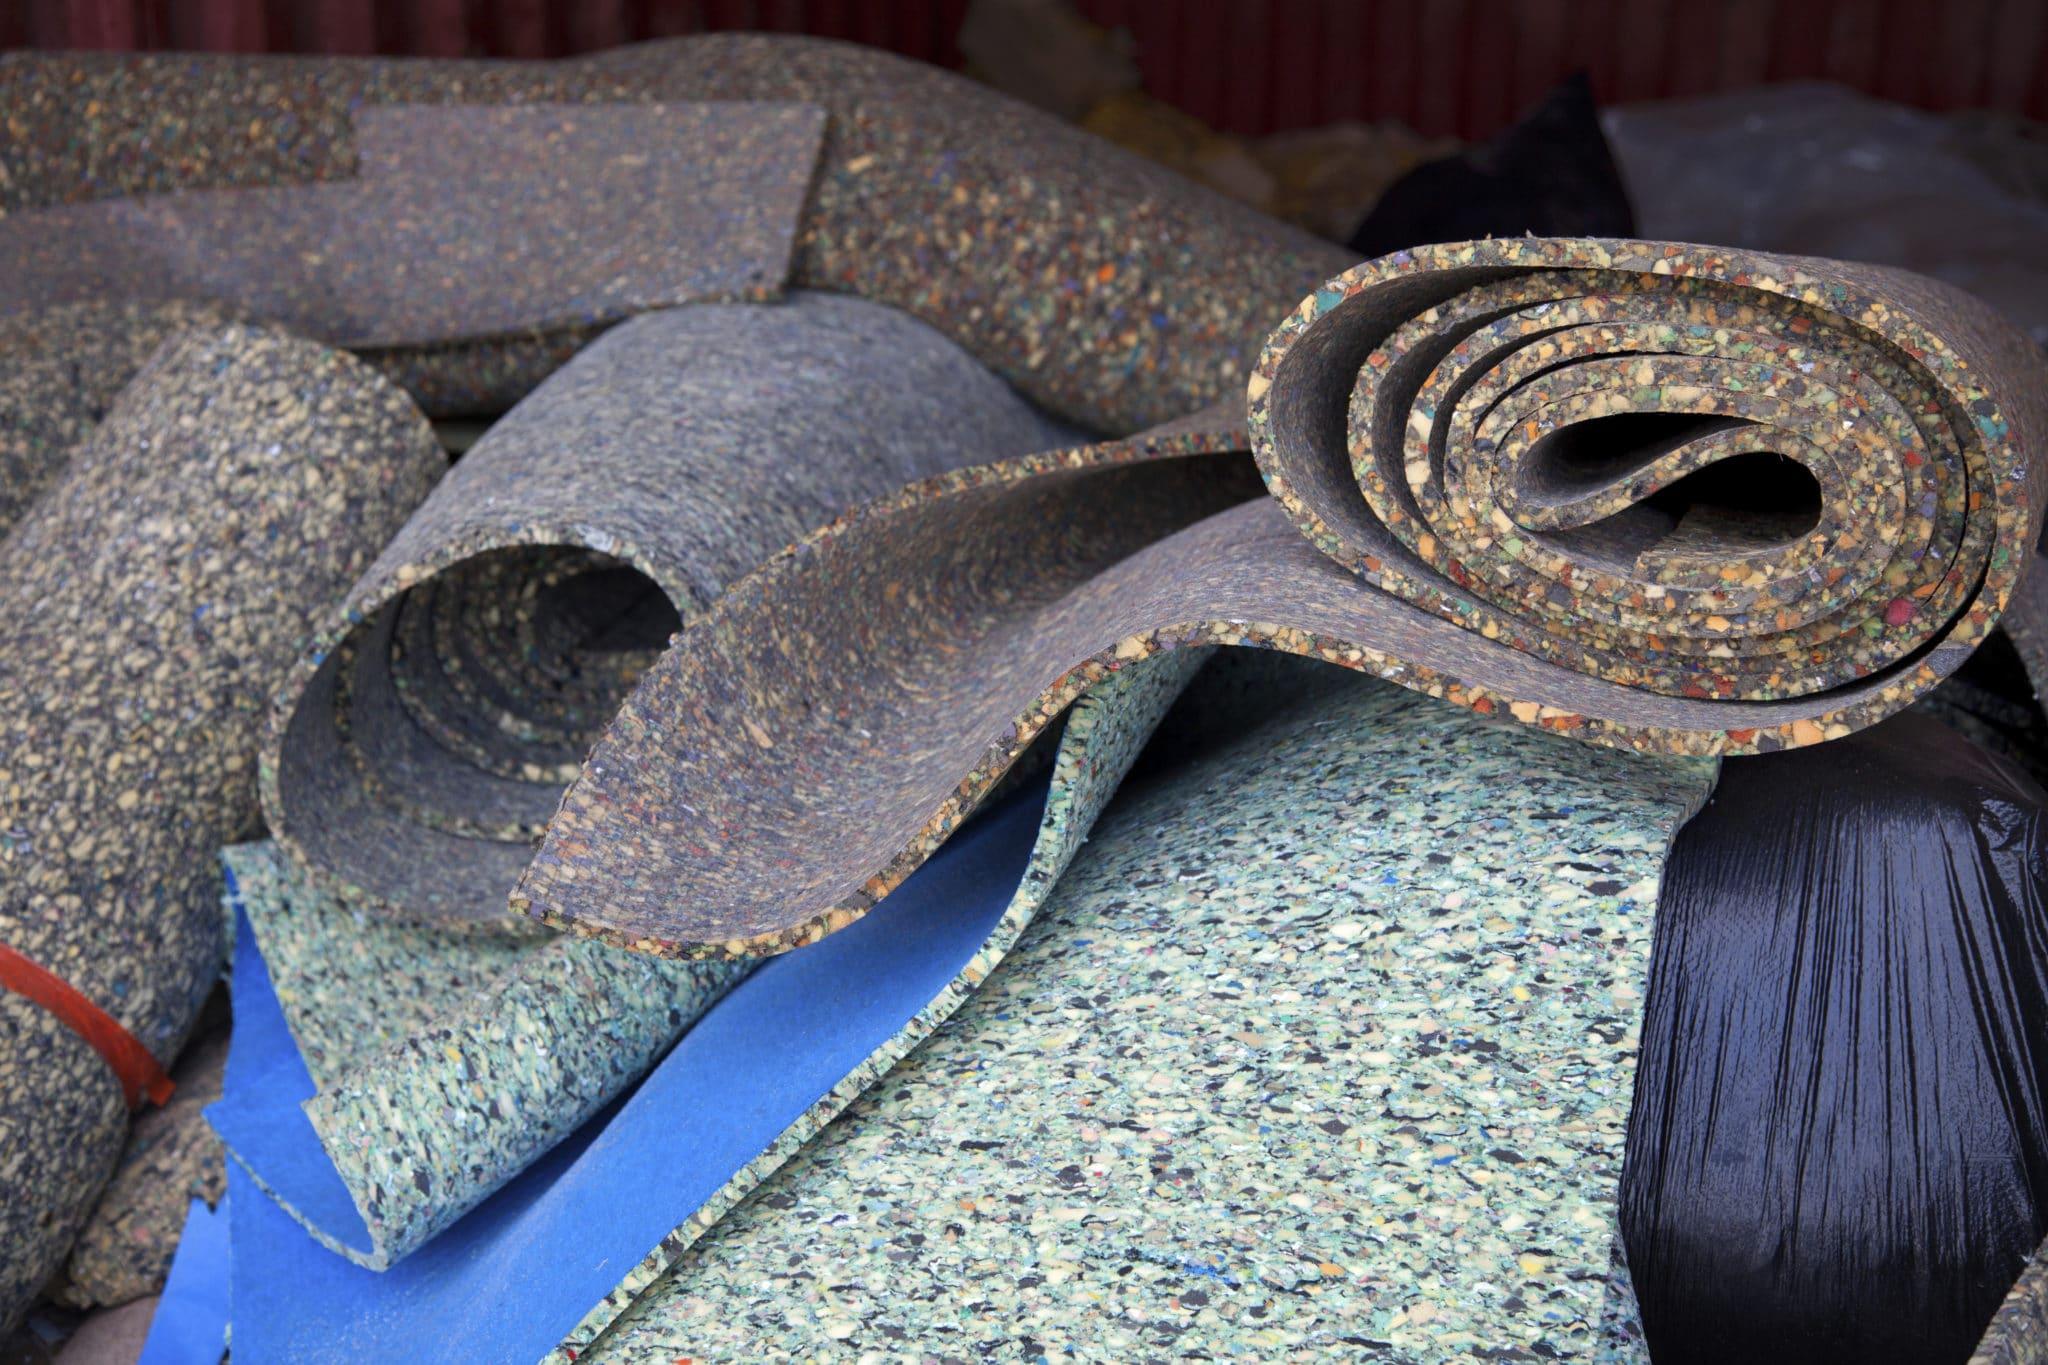 Sloane's Carpet Padding